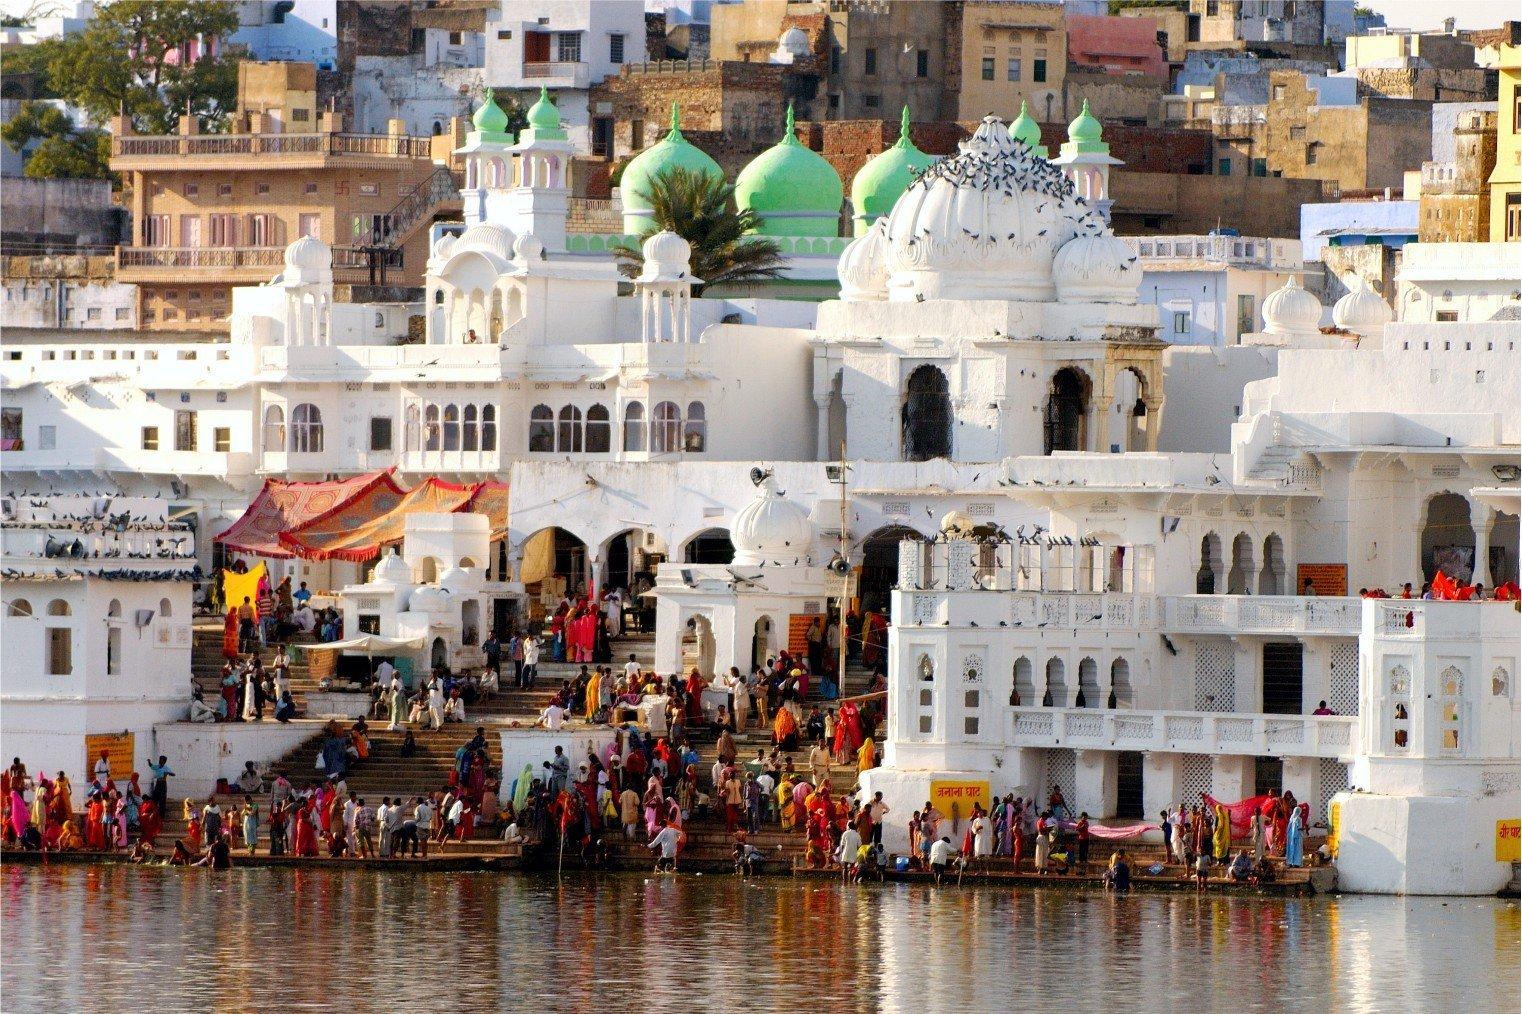 Пушкар, Индия. Pushkar, India